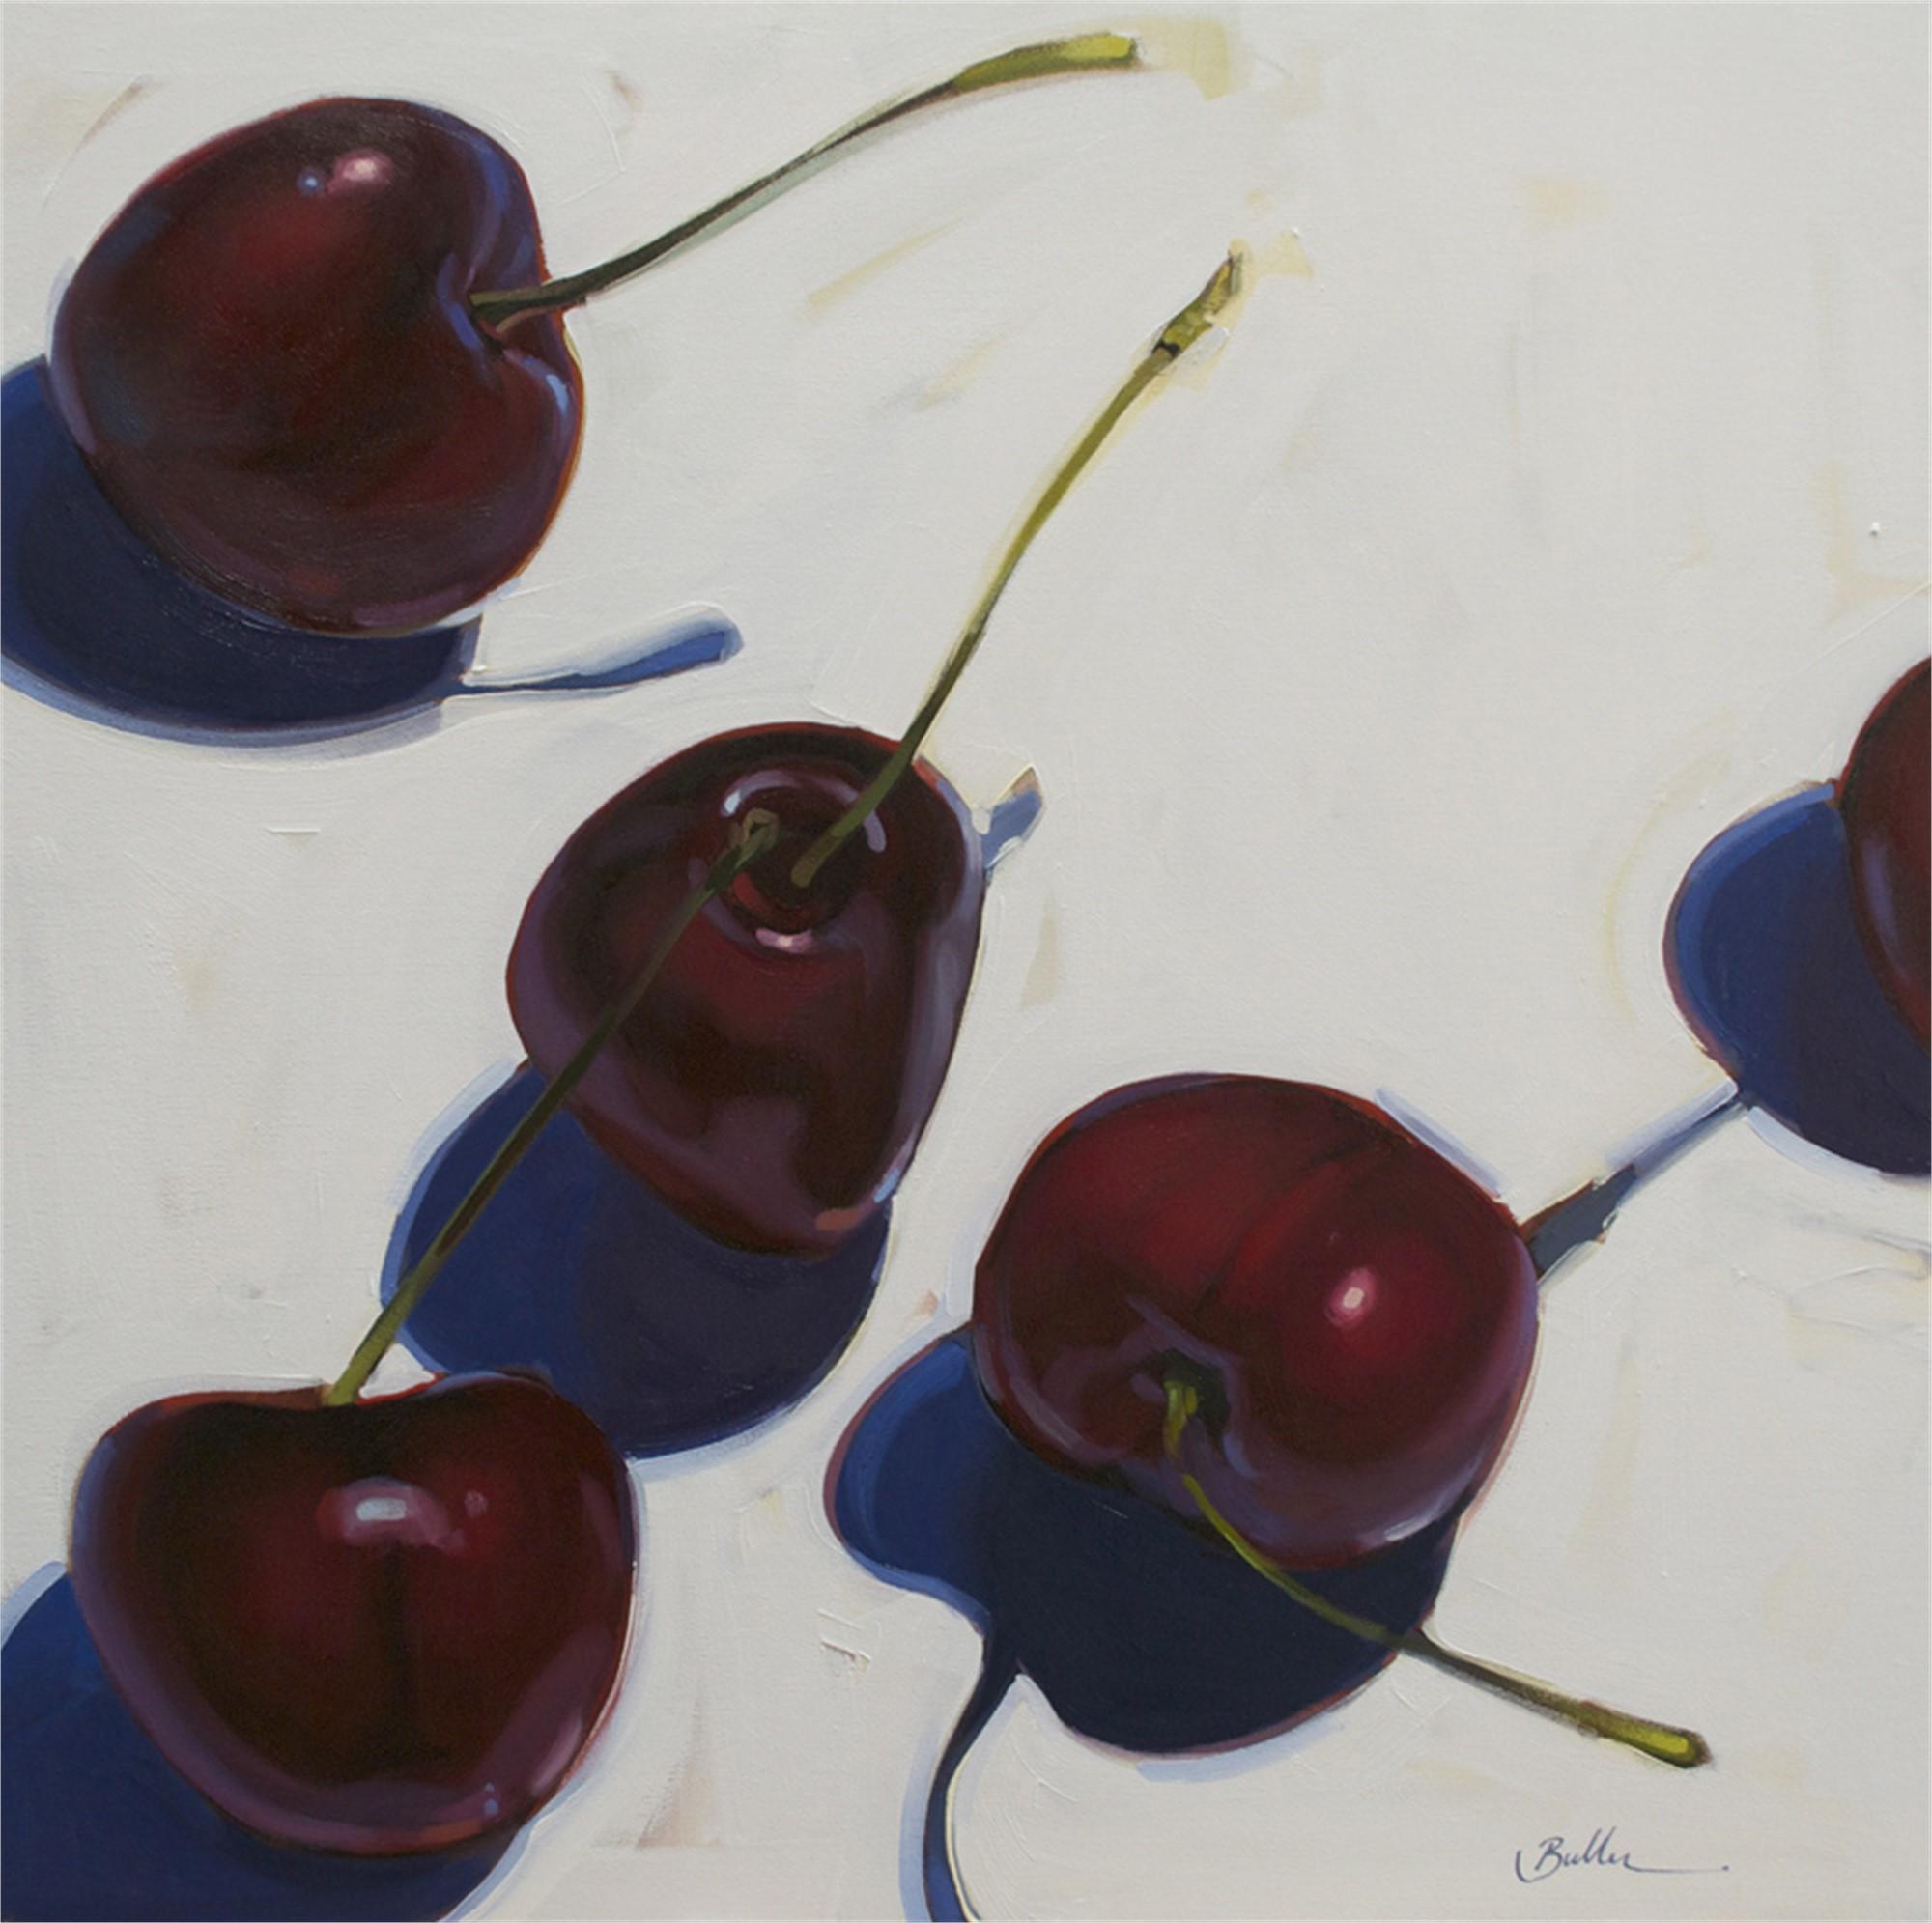 Cherry Season by Samantha Buller